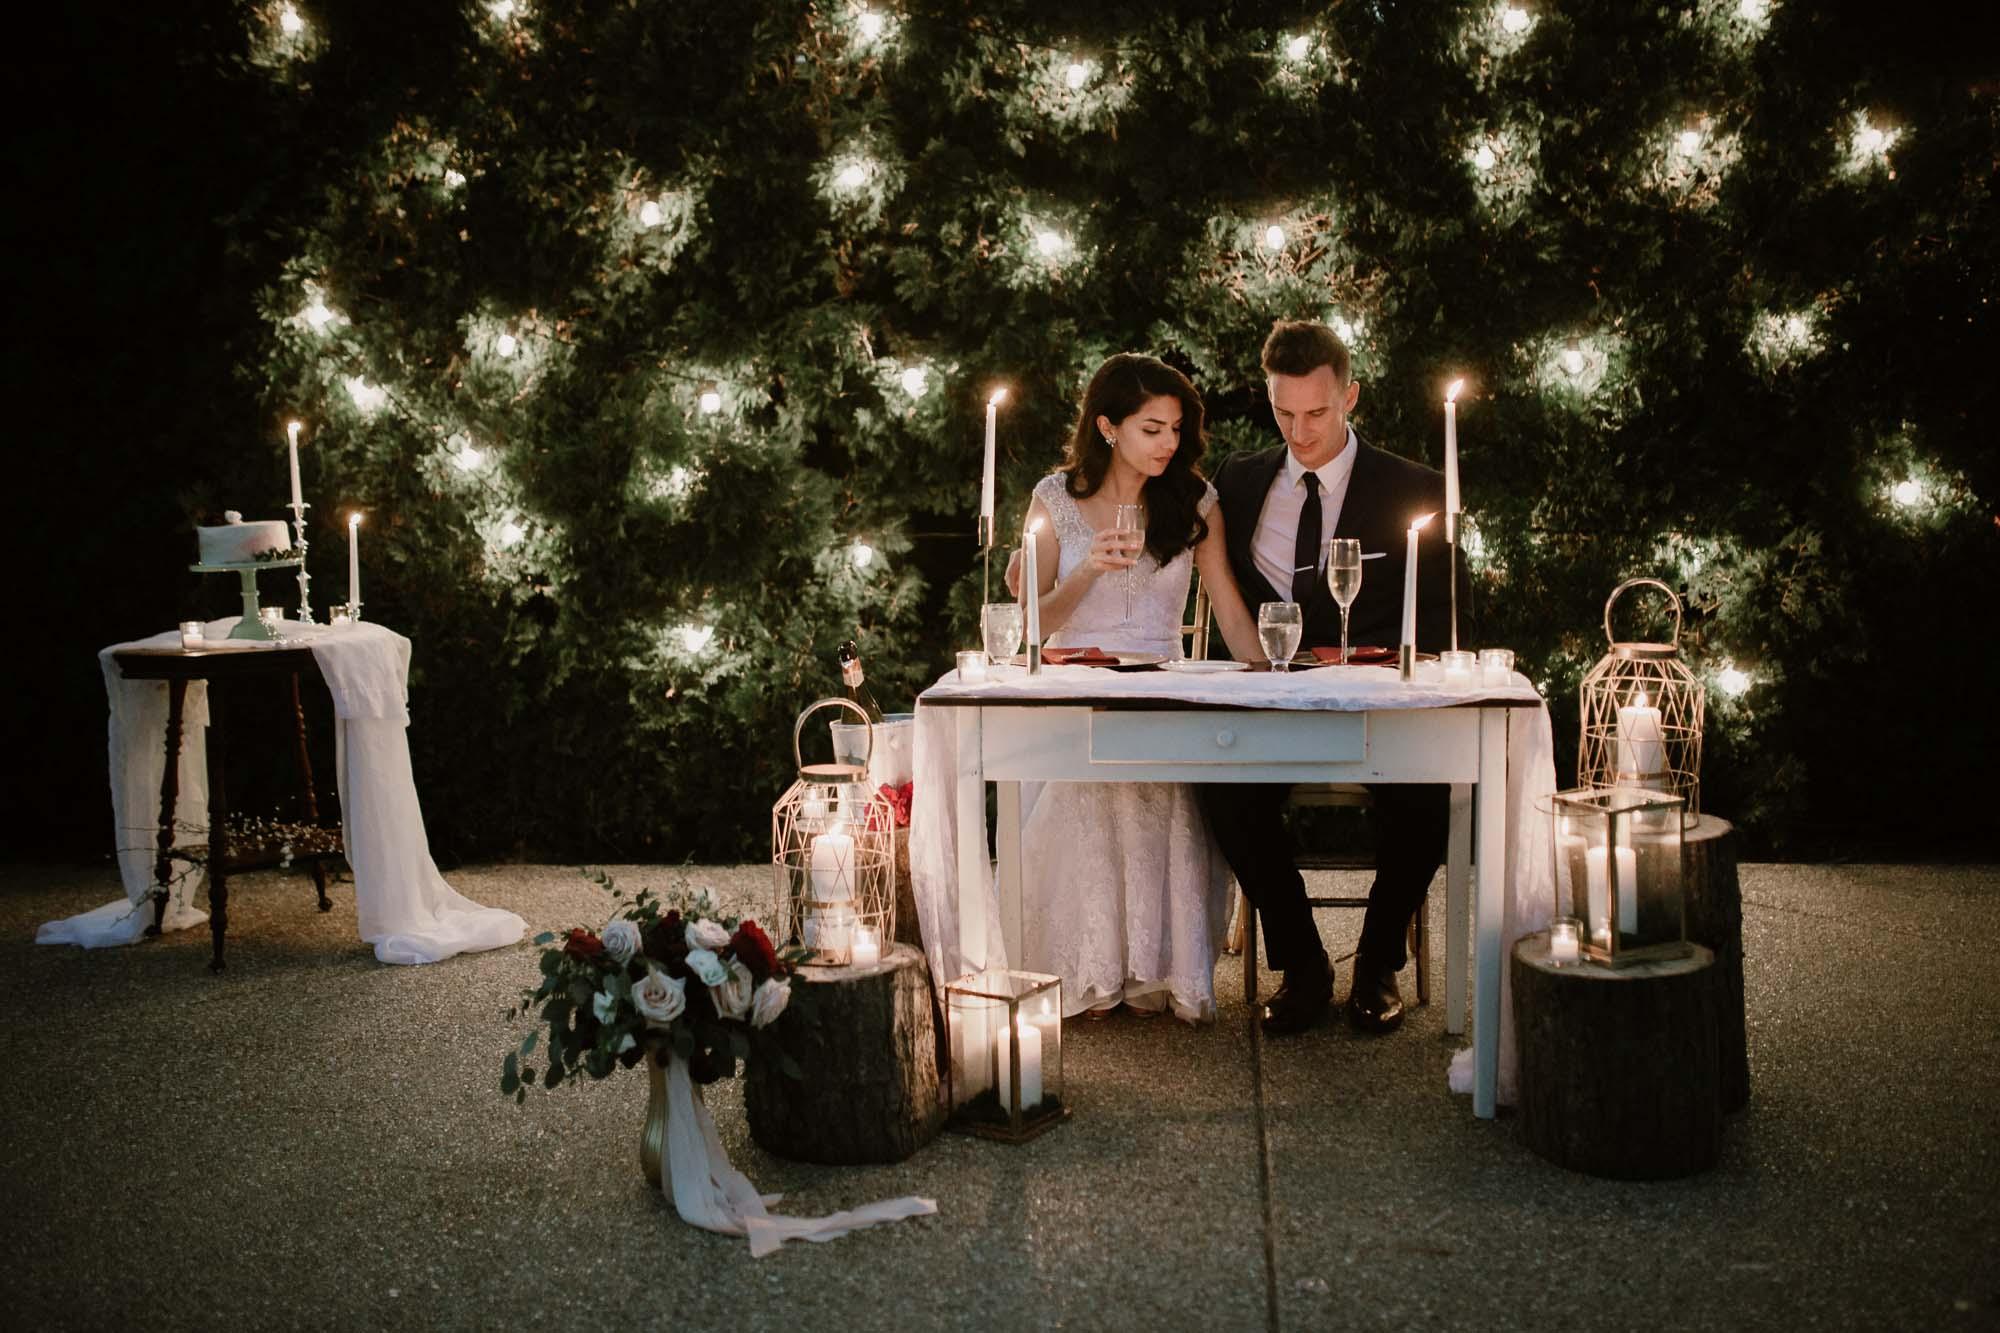 champaign_il_wedding_photography-0956.jpg